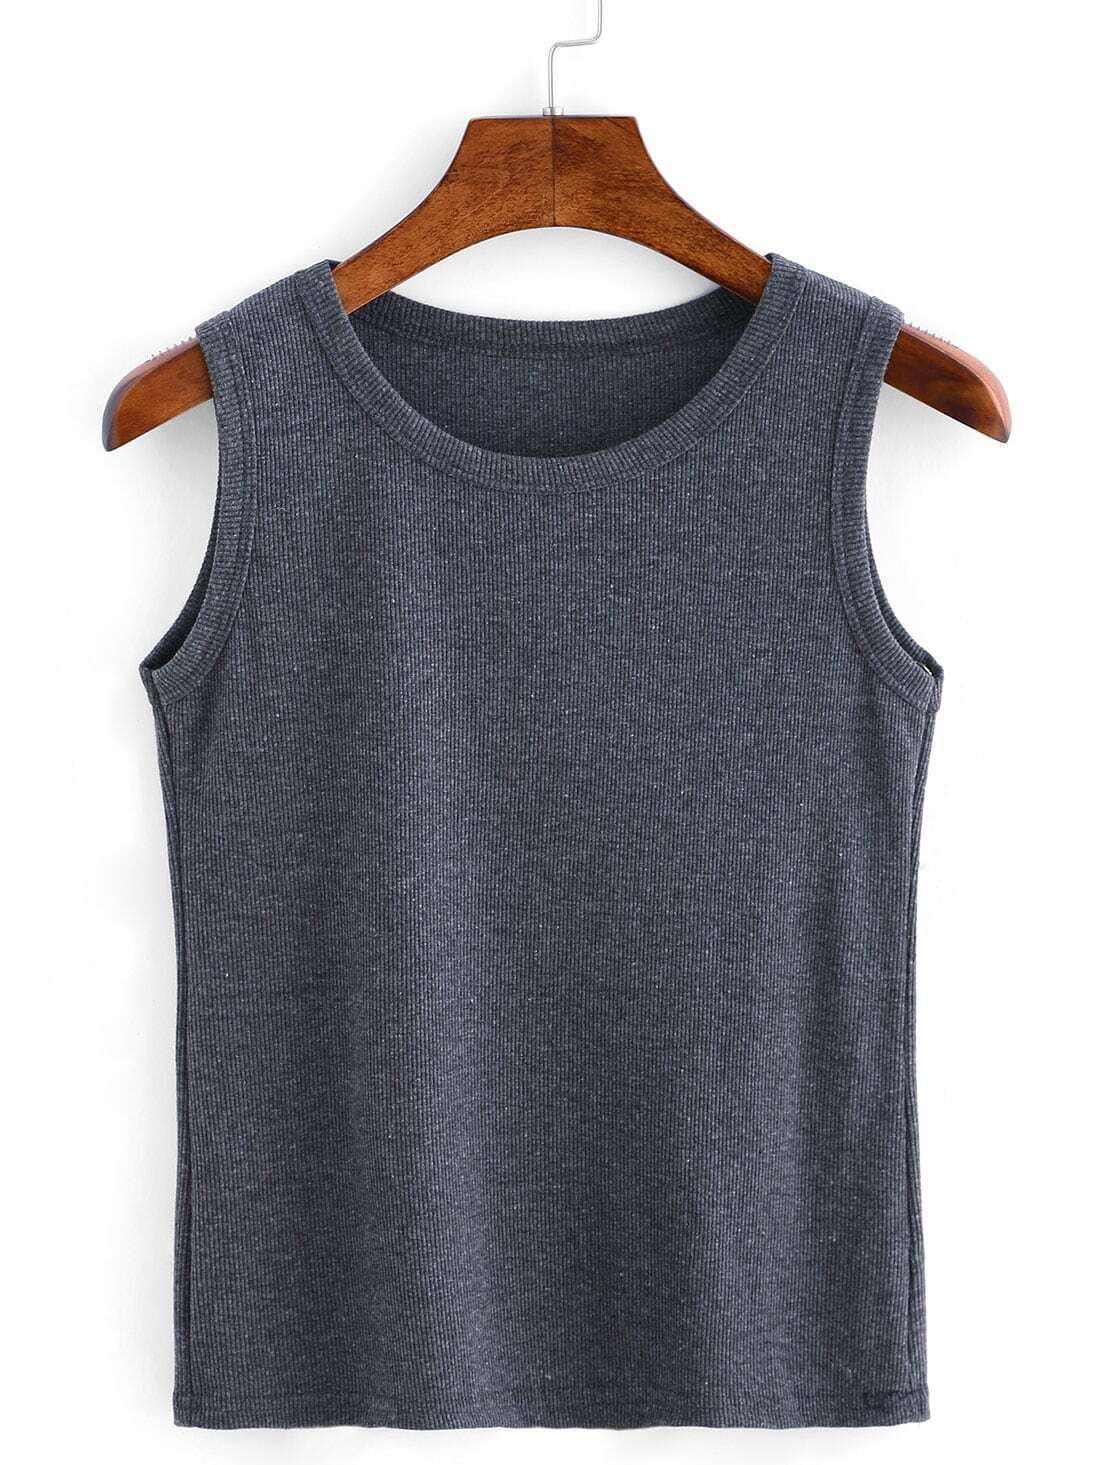 Ribbed Knit Crop Tank Top - Grey sweater160505301